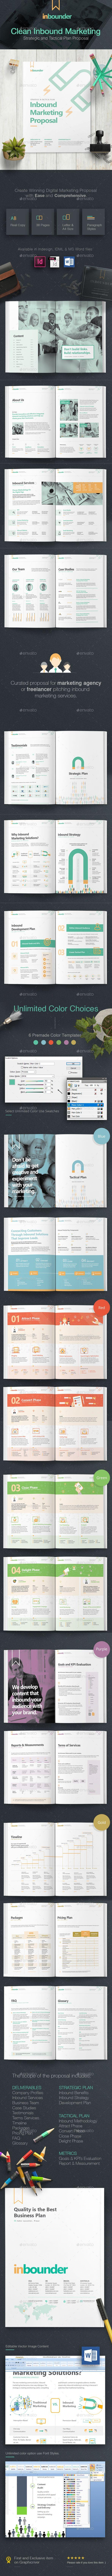 Inbound Marketing Proposal Template InDesign INDD